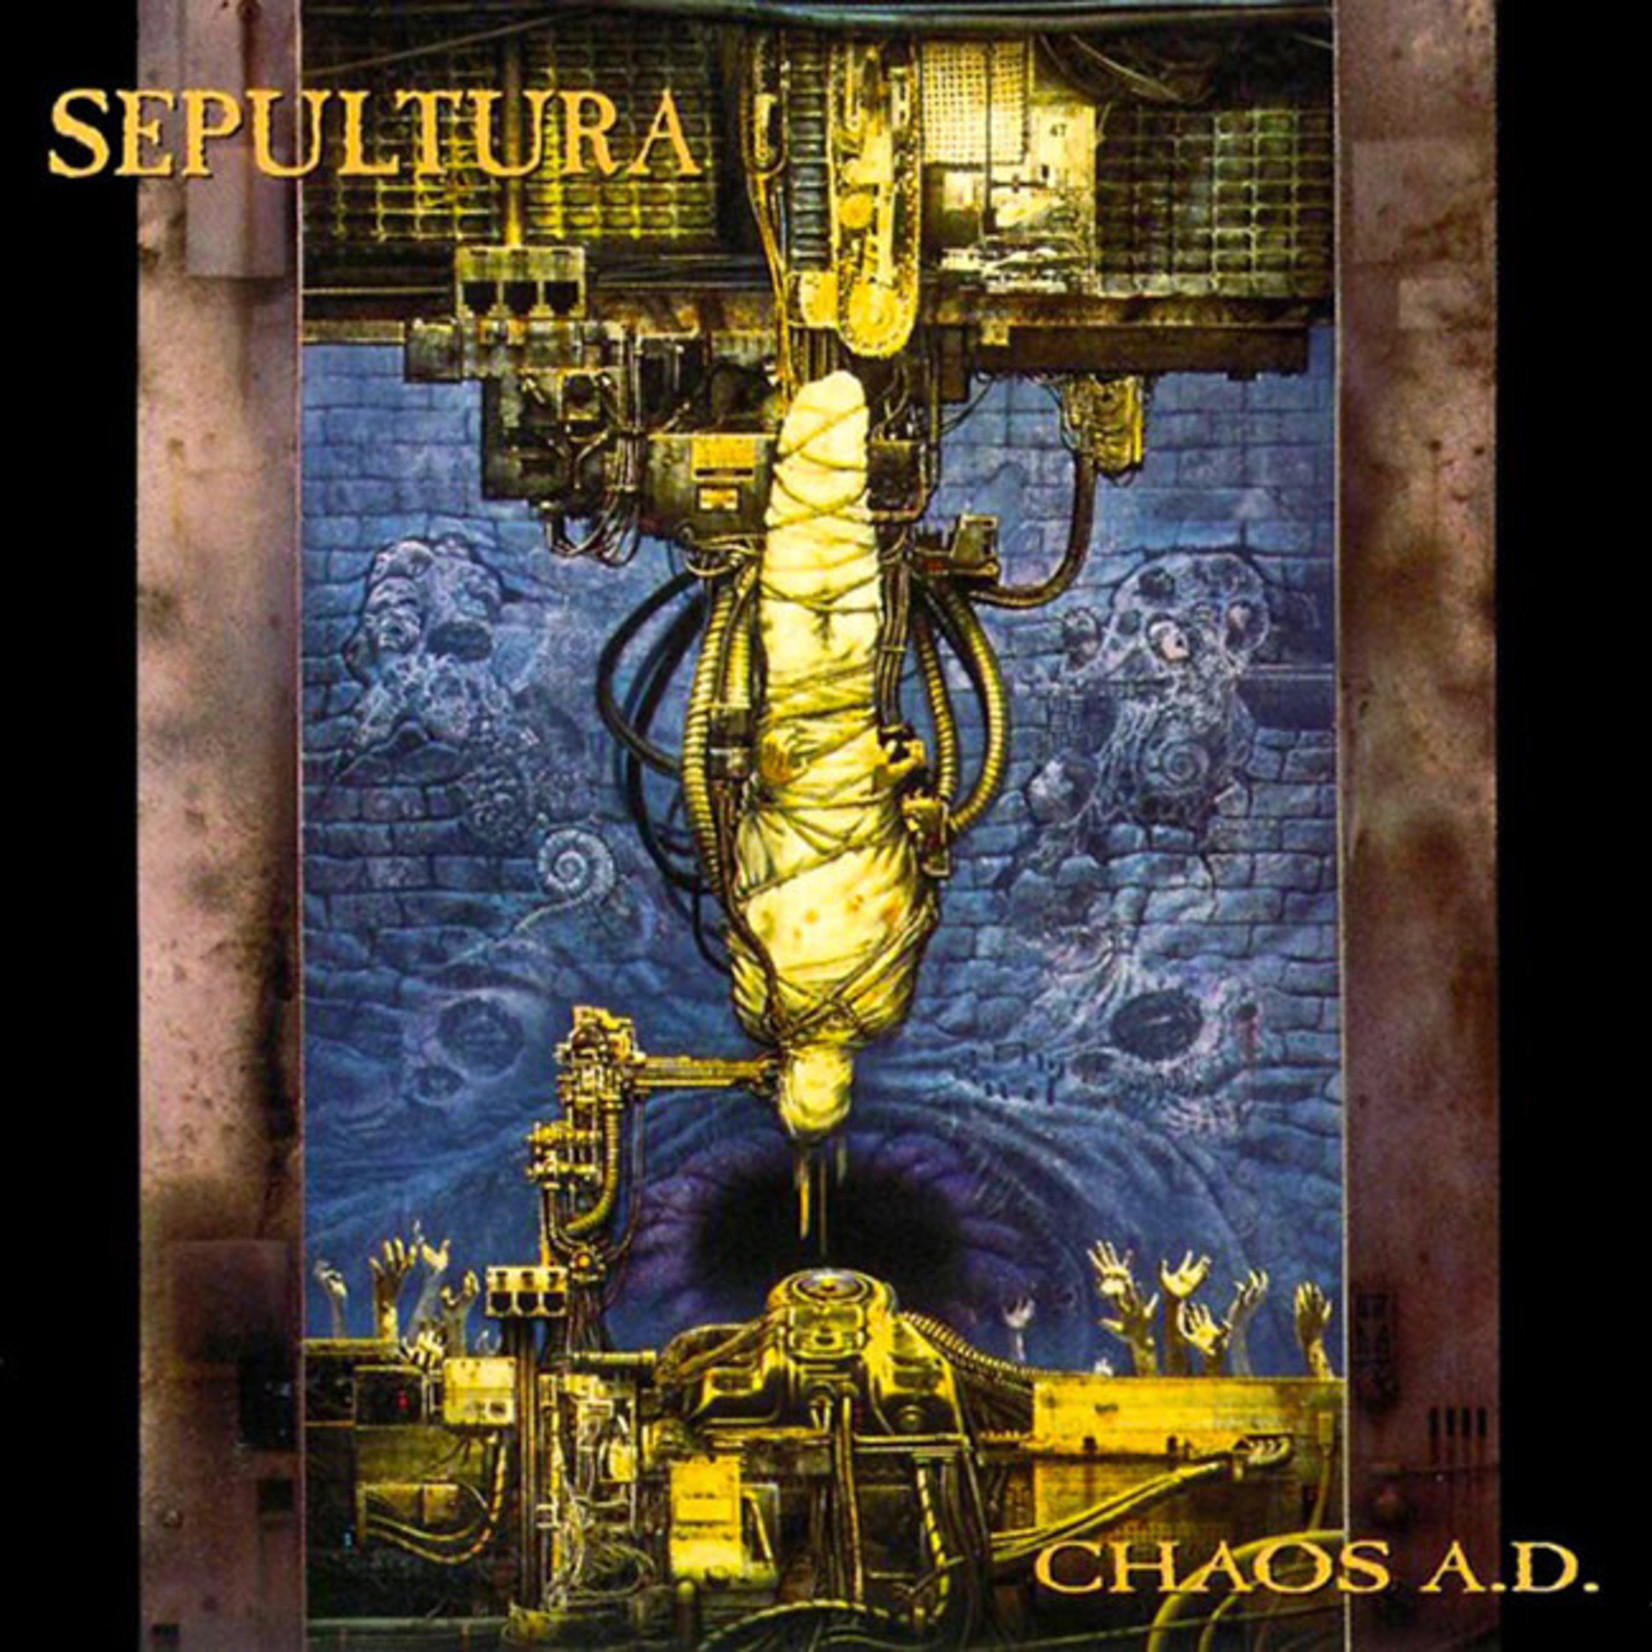 [New] Sepultura: Chaos A.D. (2LP, Expanded Ed.)